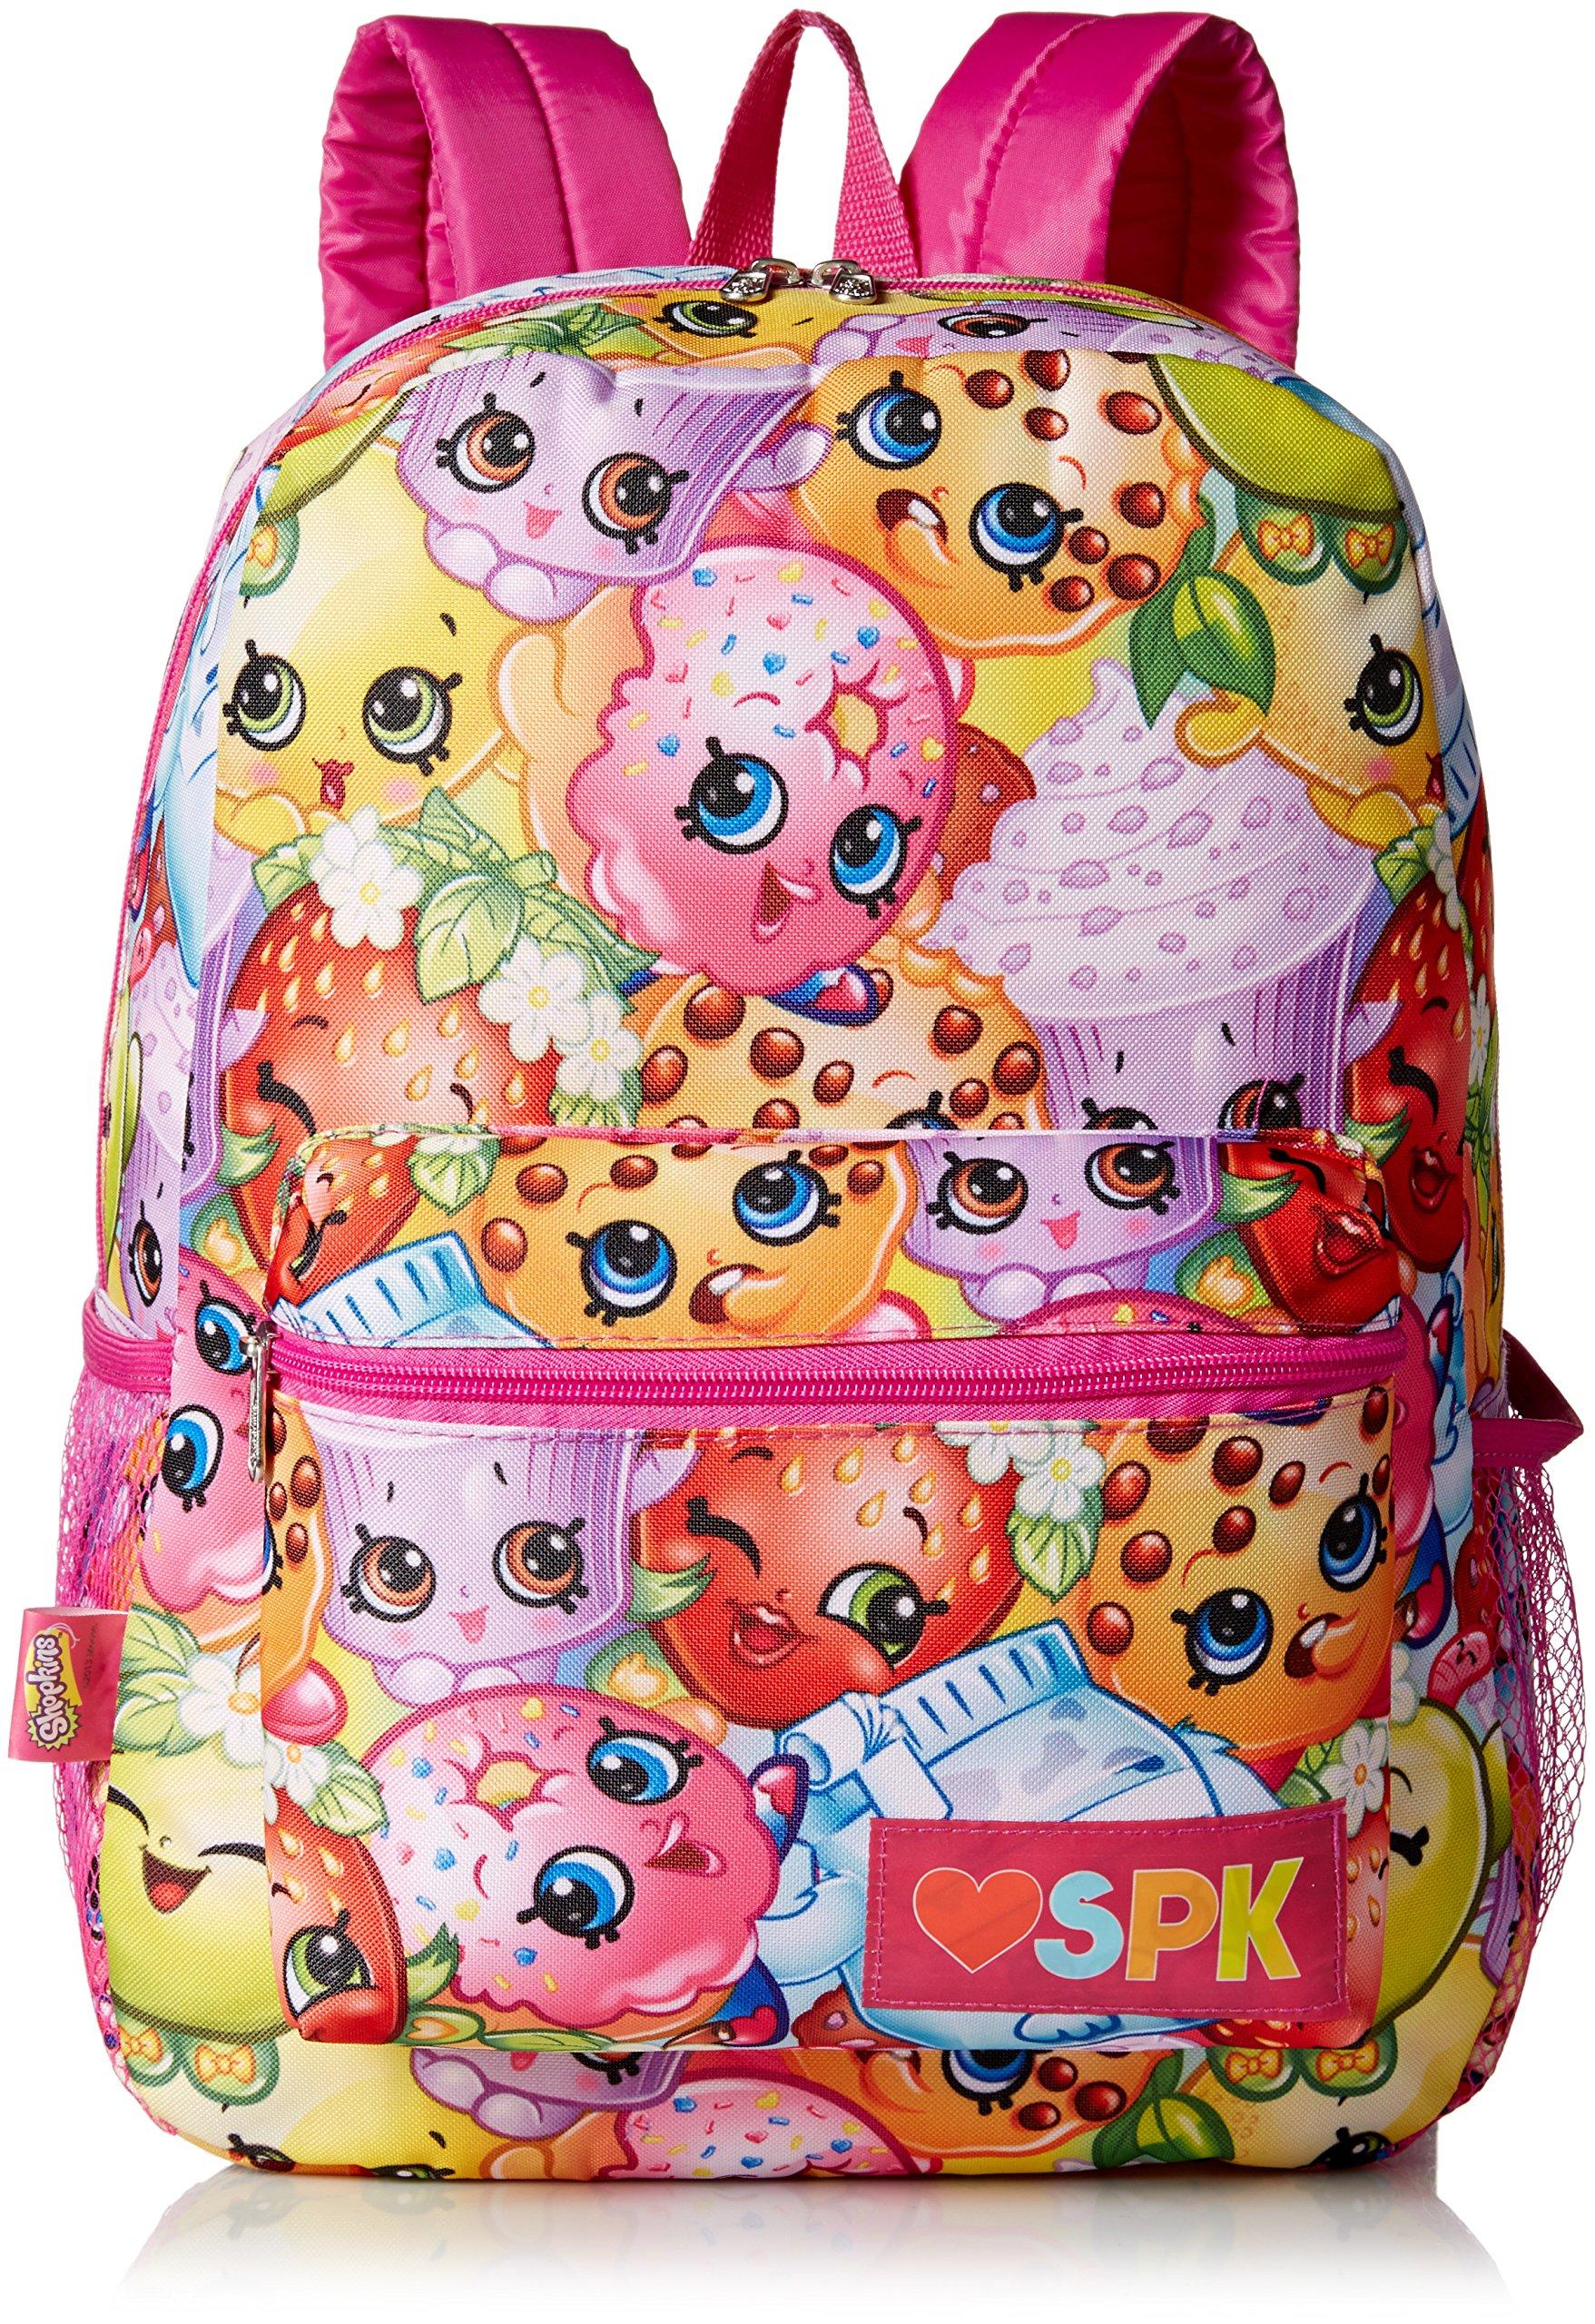 Shopkins Girls Print Backpack, multi by Shopkins